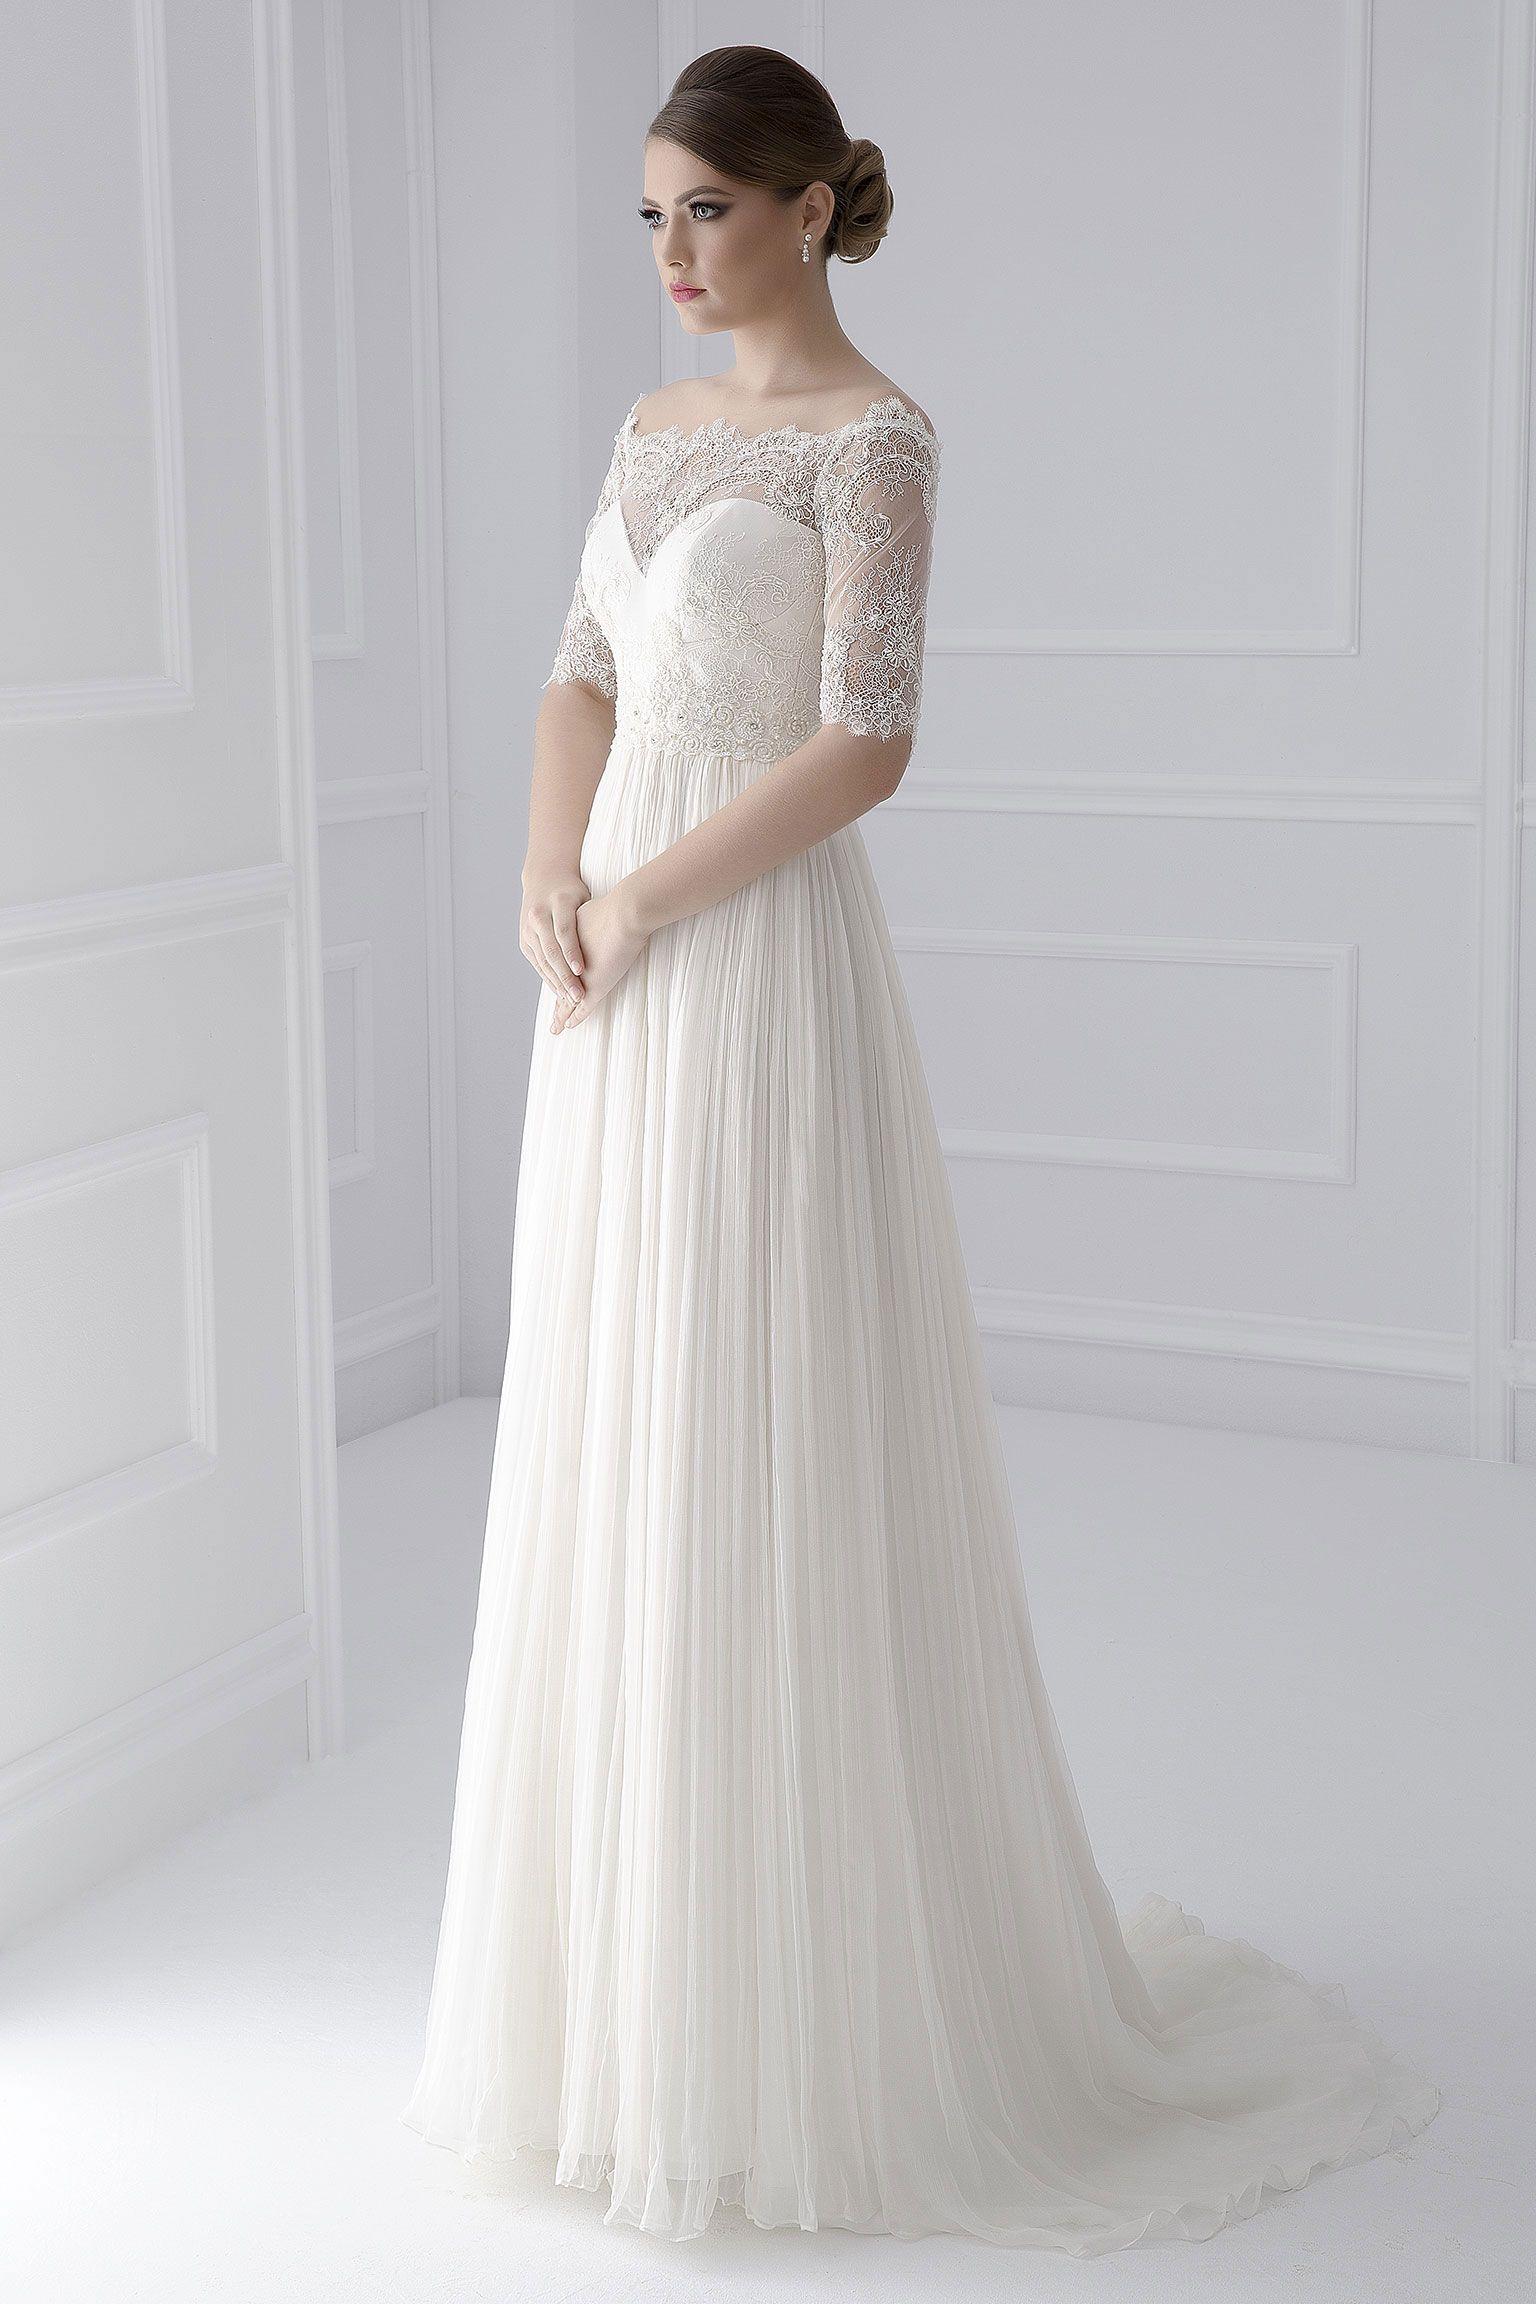 preț rezonabil nuante de mărci recunoscute White Lady - colectia de rochii de mireasa 2015   Dresses, Wedding ...